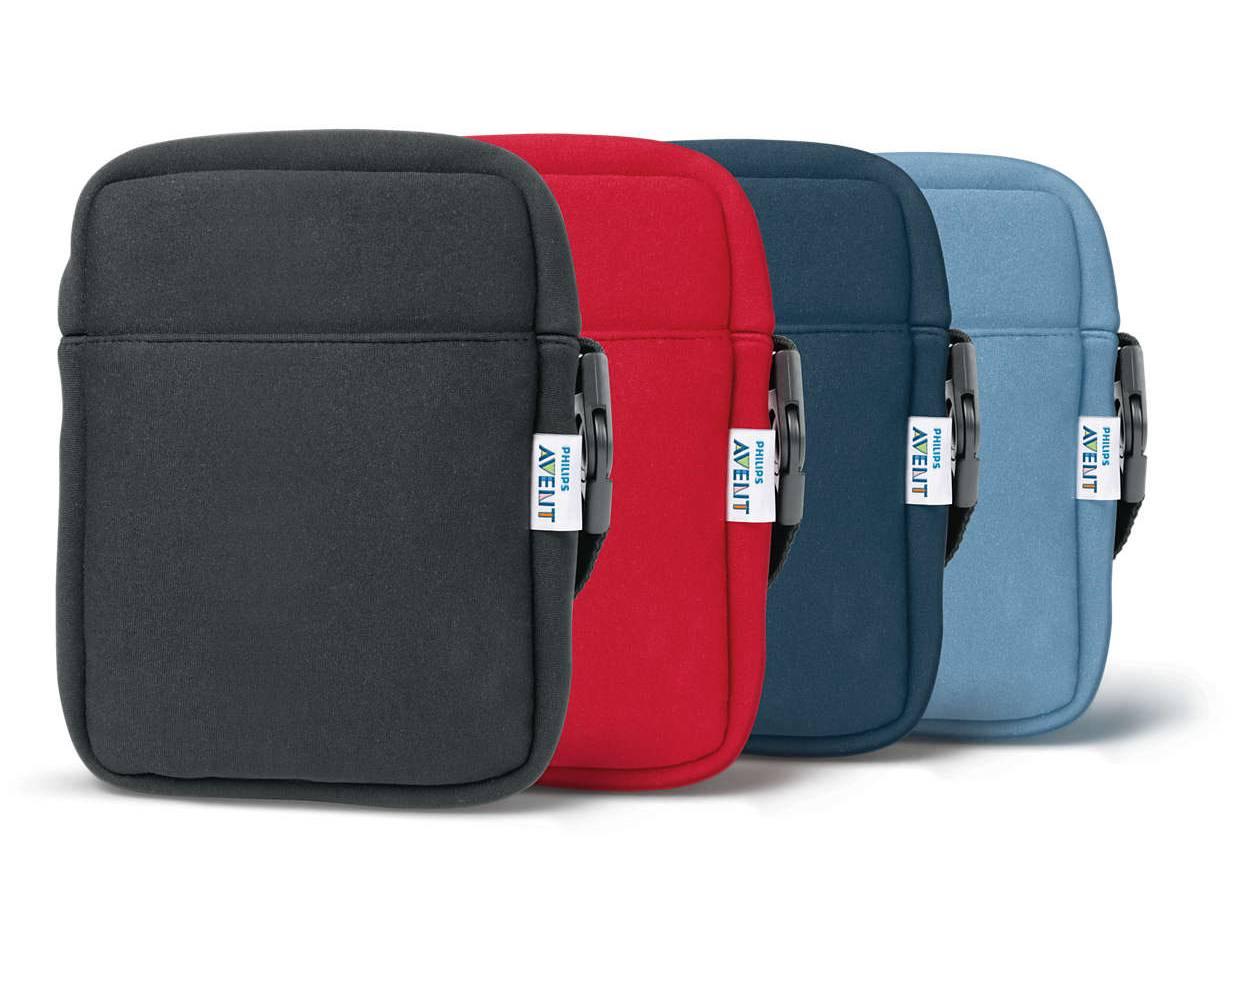 Philips Avent Neoprene Therma Bag Mixed